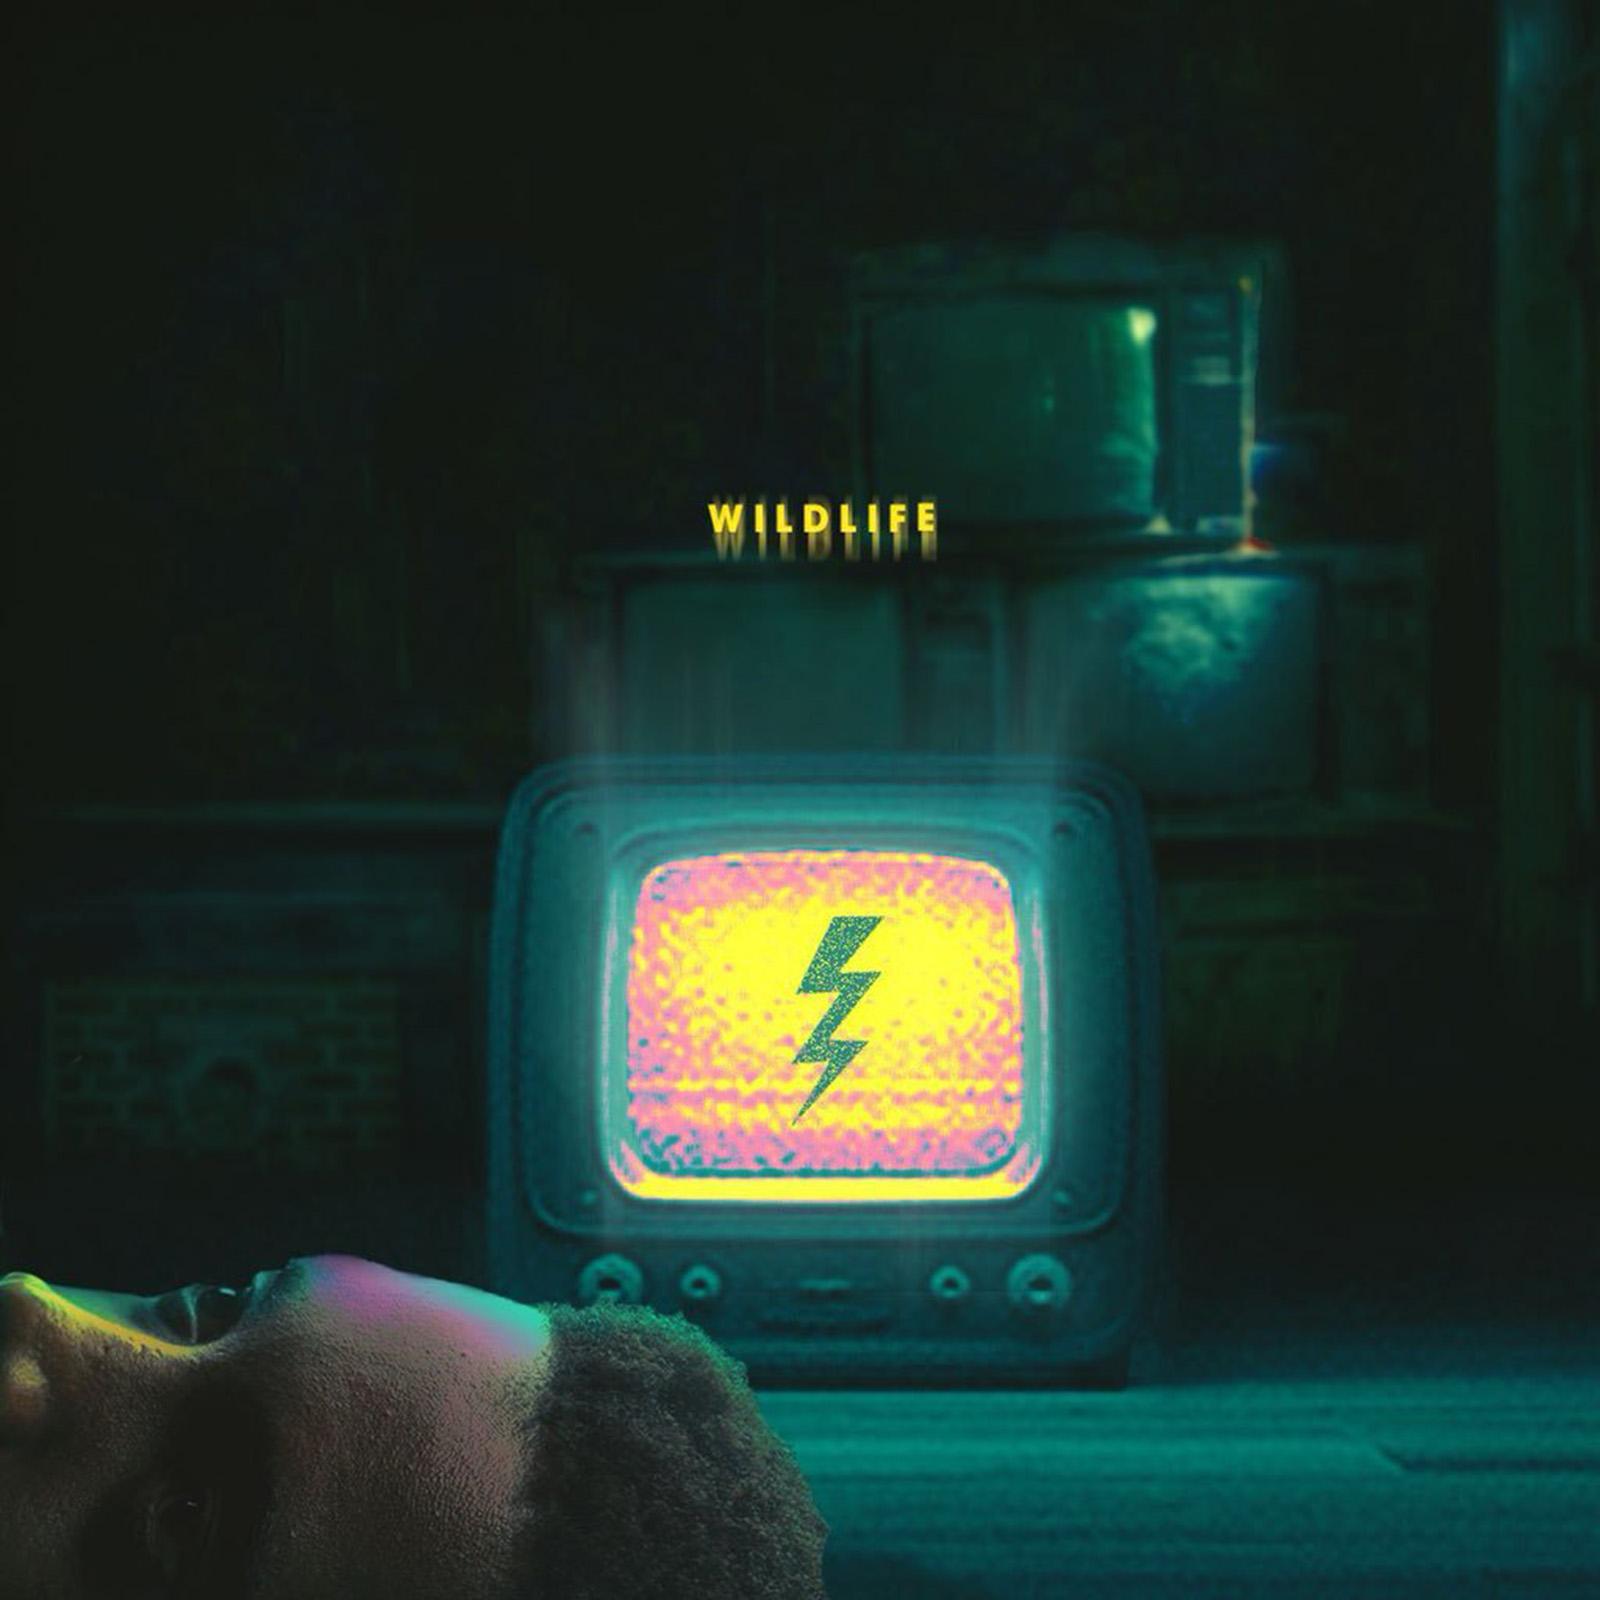 WildLife EP by BRYAN THE MENSAH